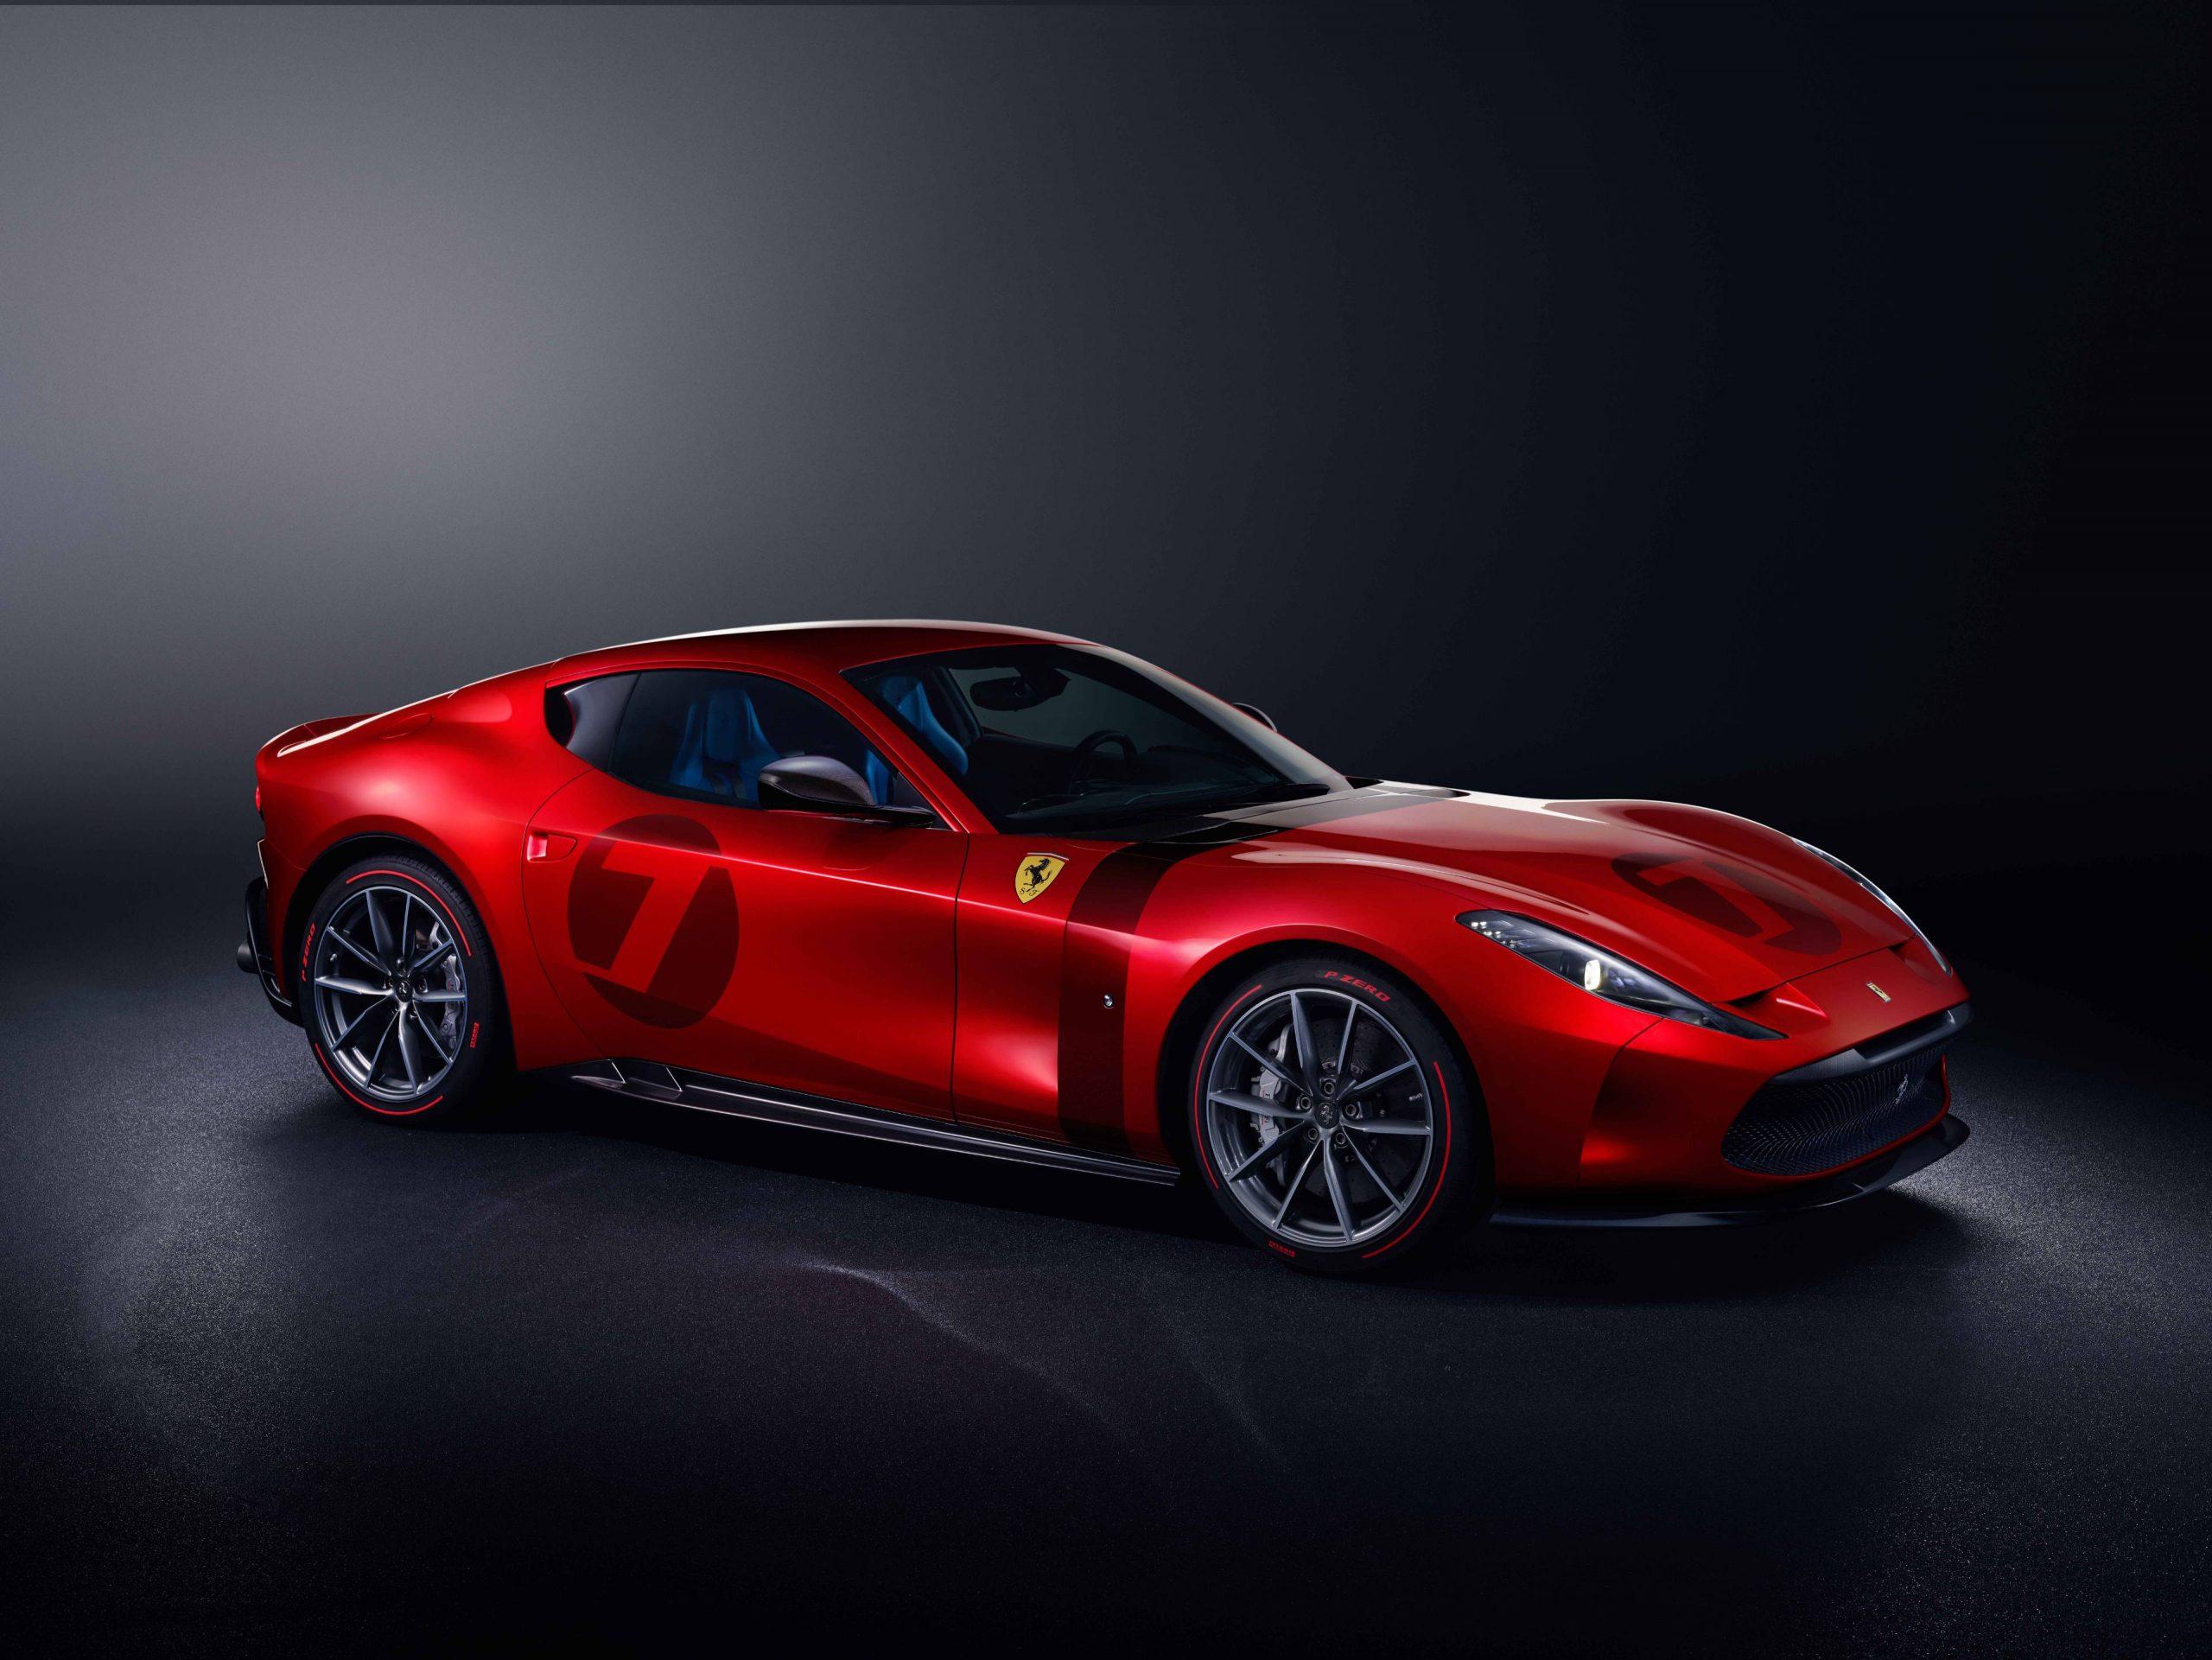 The new Ferrari Omologata supercar is the dream of one lucky gentleman driver